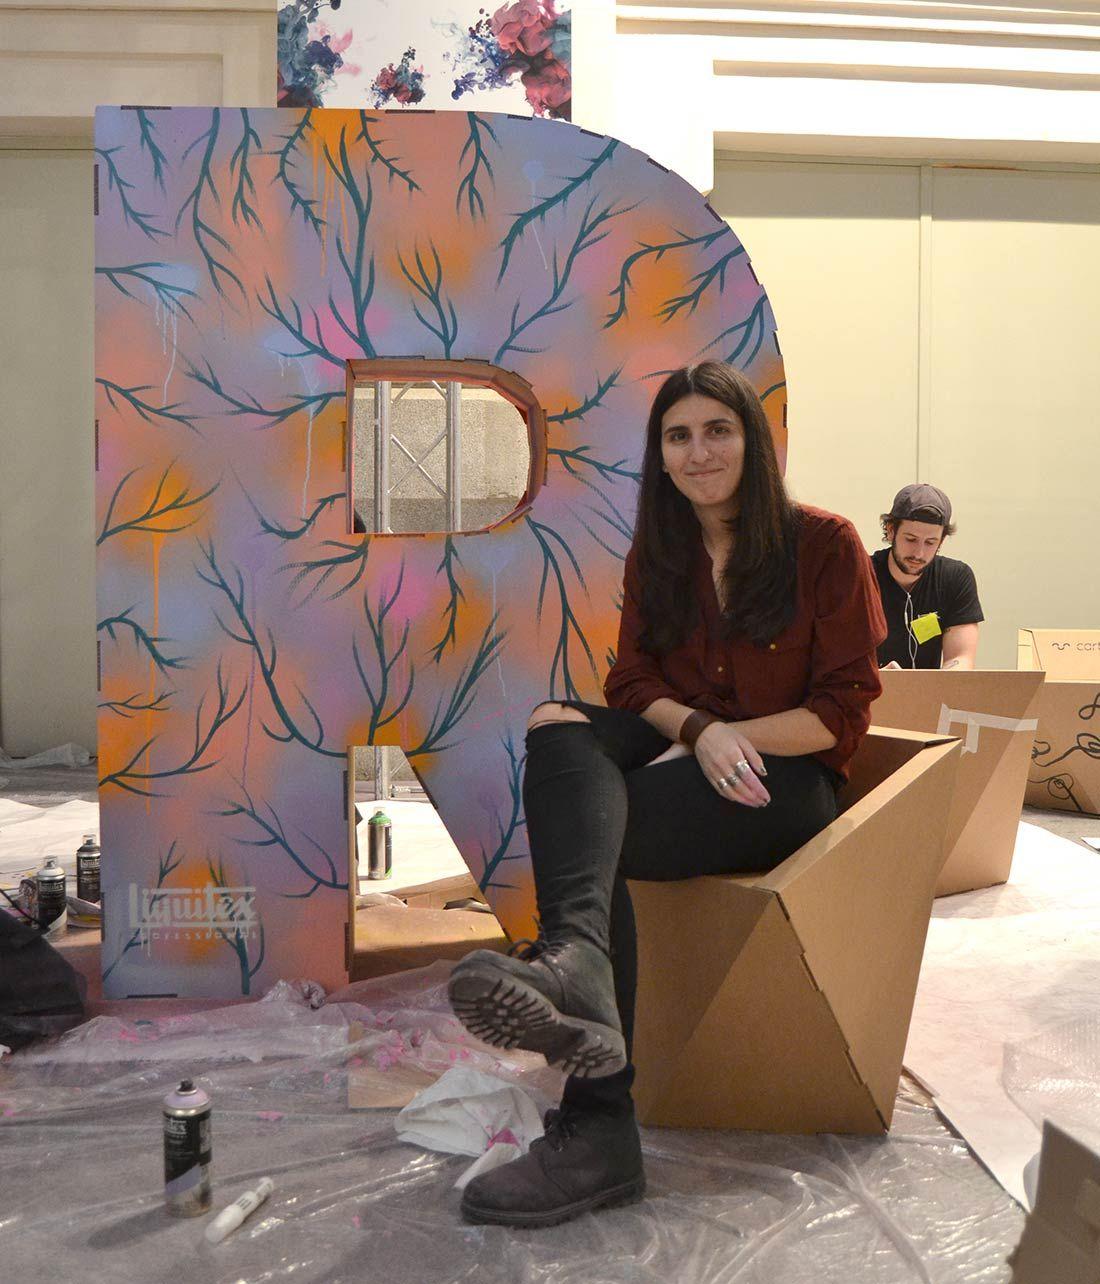 Muebles De Cart N Para Art Madrid Liquitex # Muebles En New Haven Ct